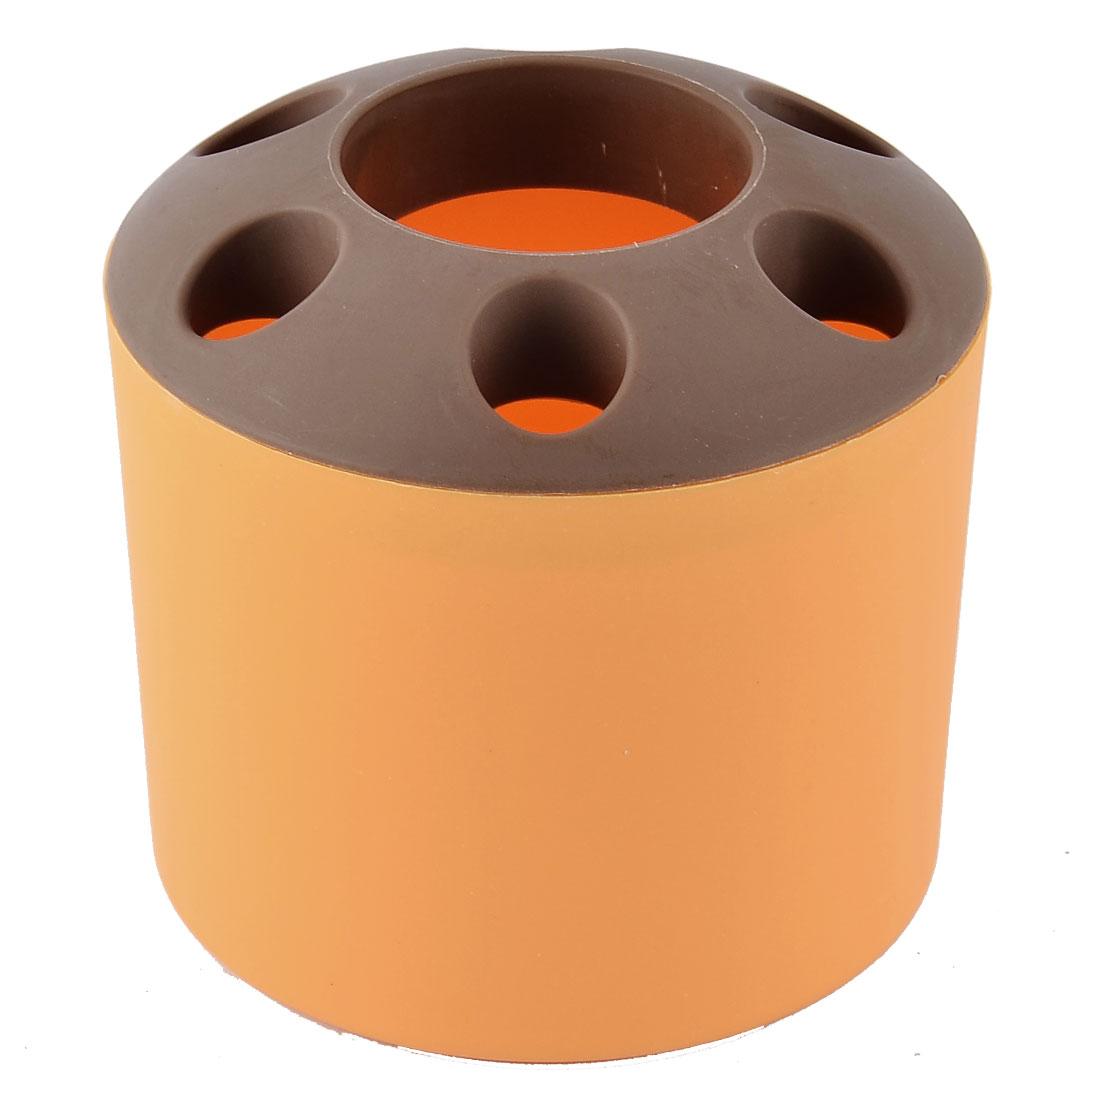 Uxcell Bathroom Toothbrush Toothpaste Plastic Storage Organizer Holder Cup Orange